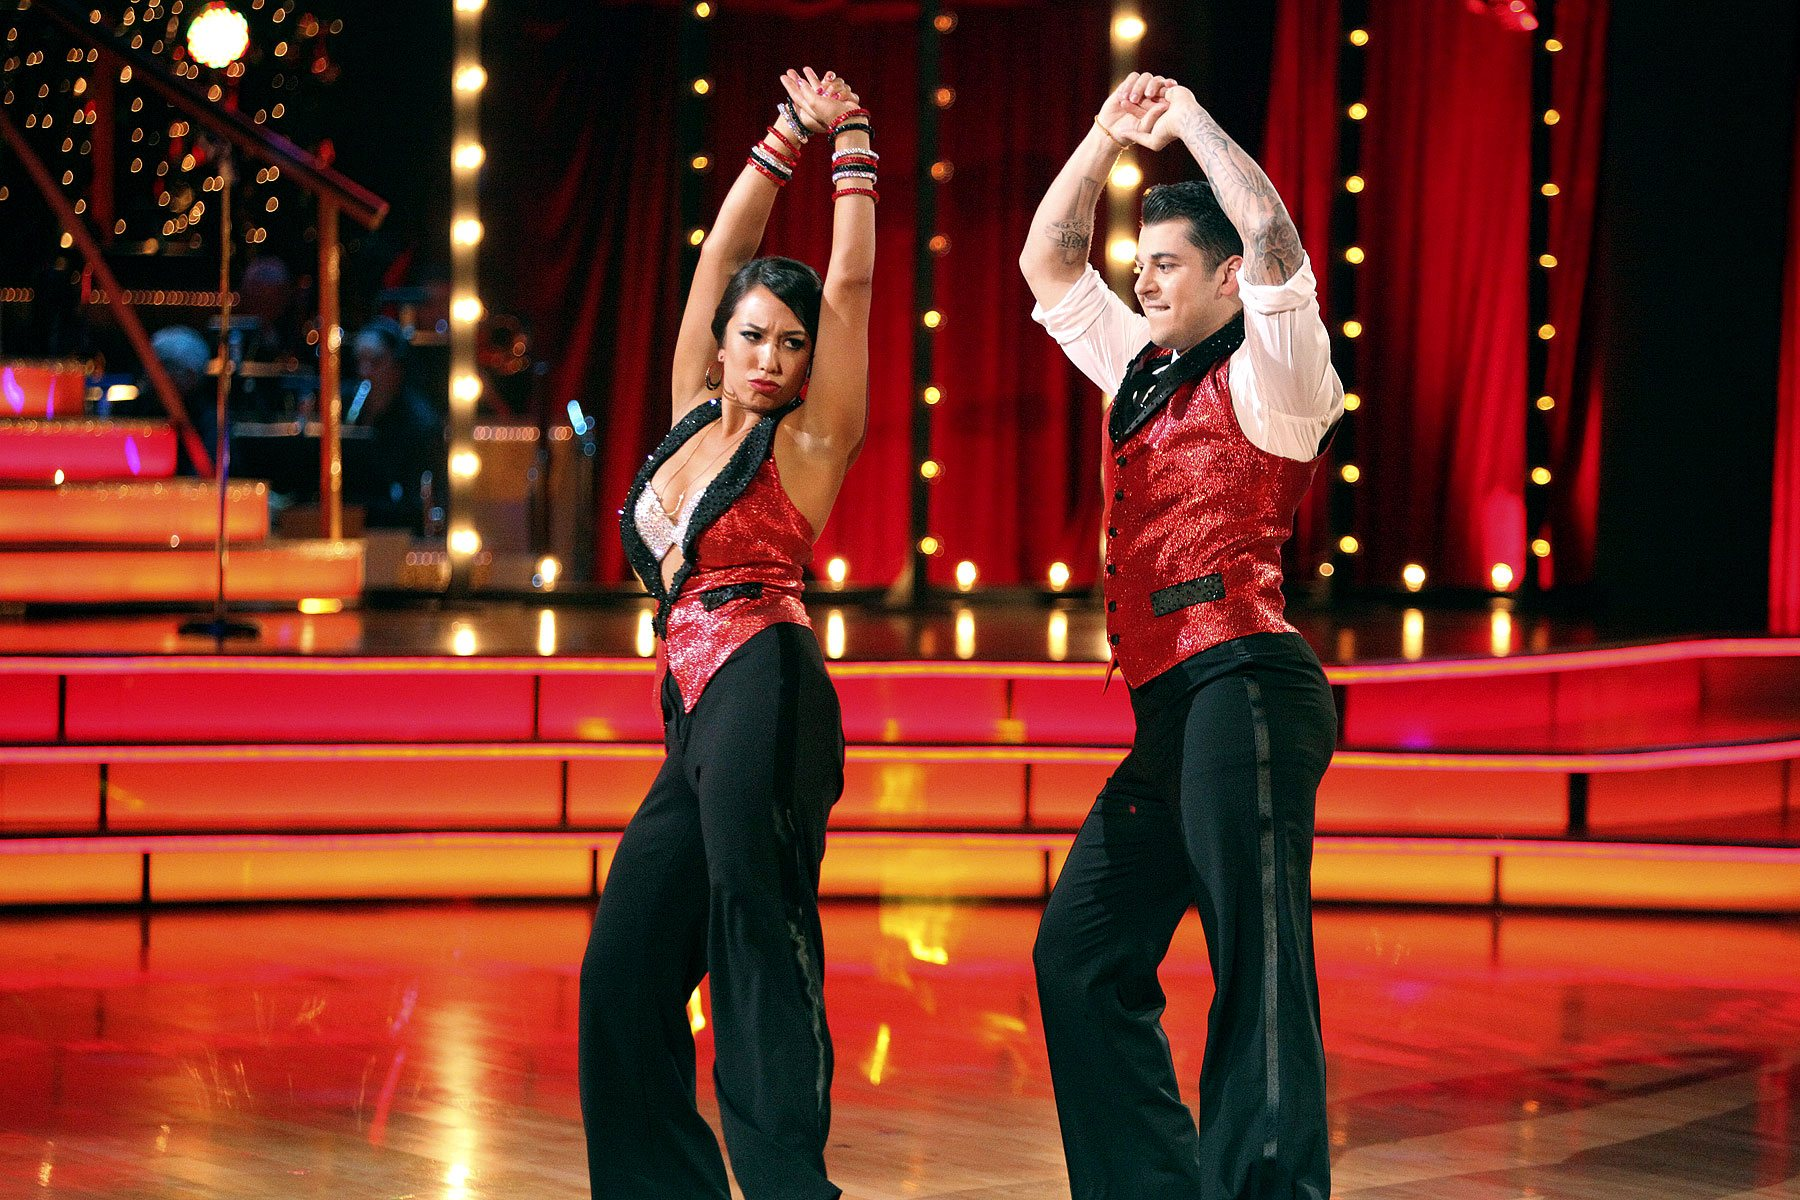 Rob Kardashian and Cheryl Burke dance in costumes